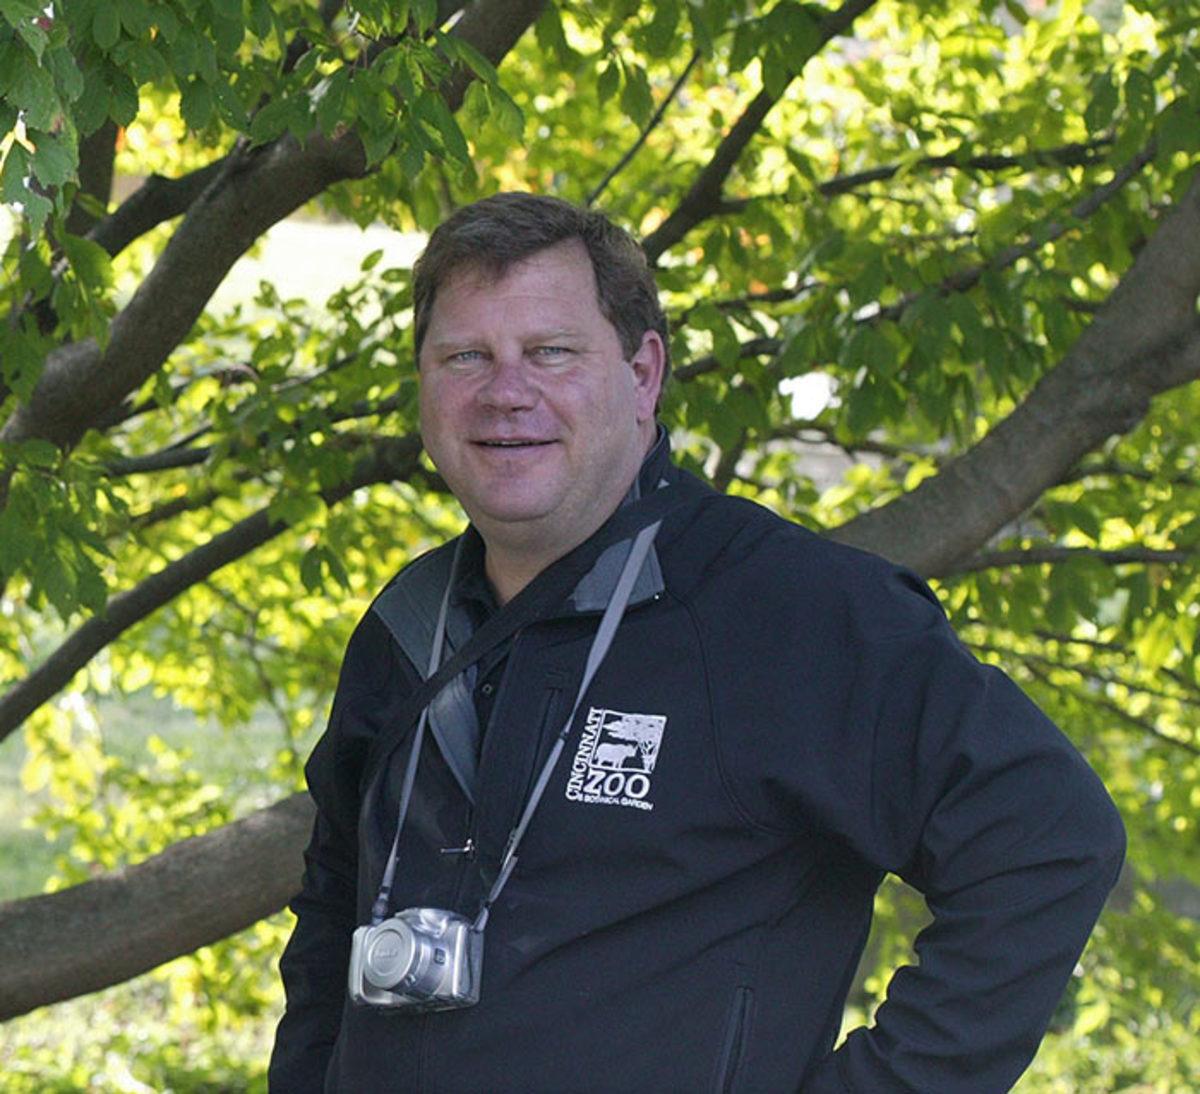 Steve Foltz, Director of Horticulture for the Cincinnati Zoo & Botanical Garden.